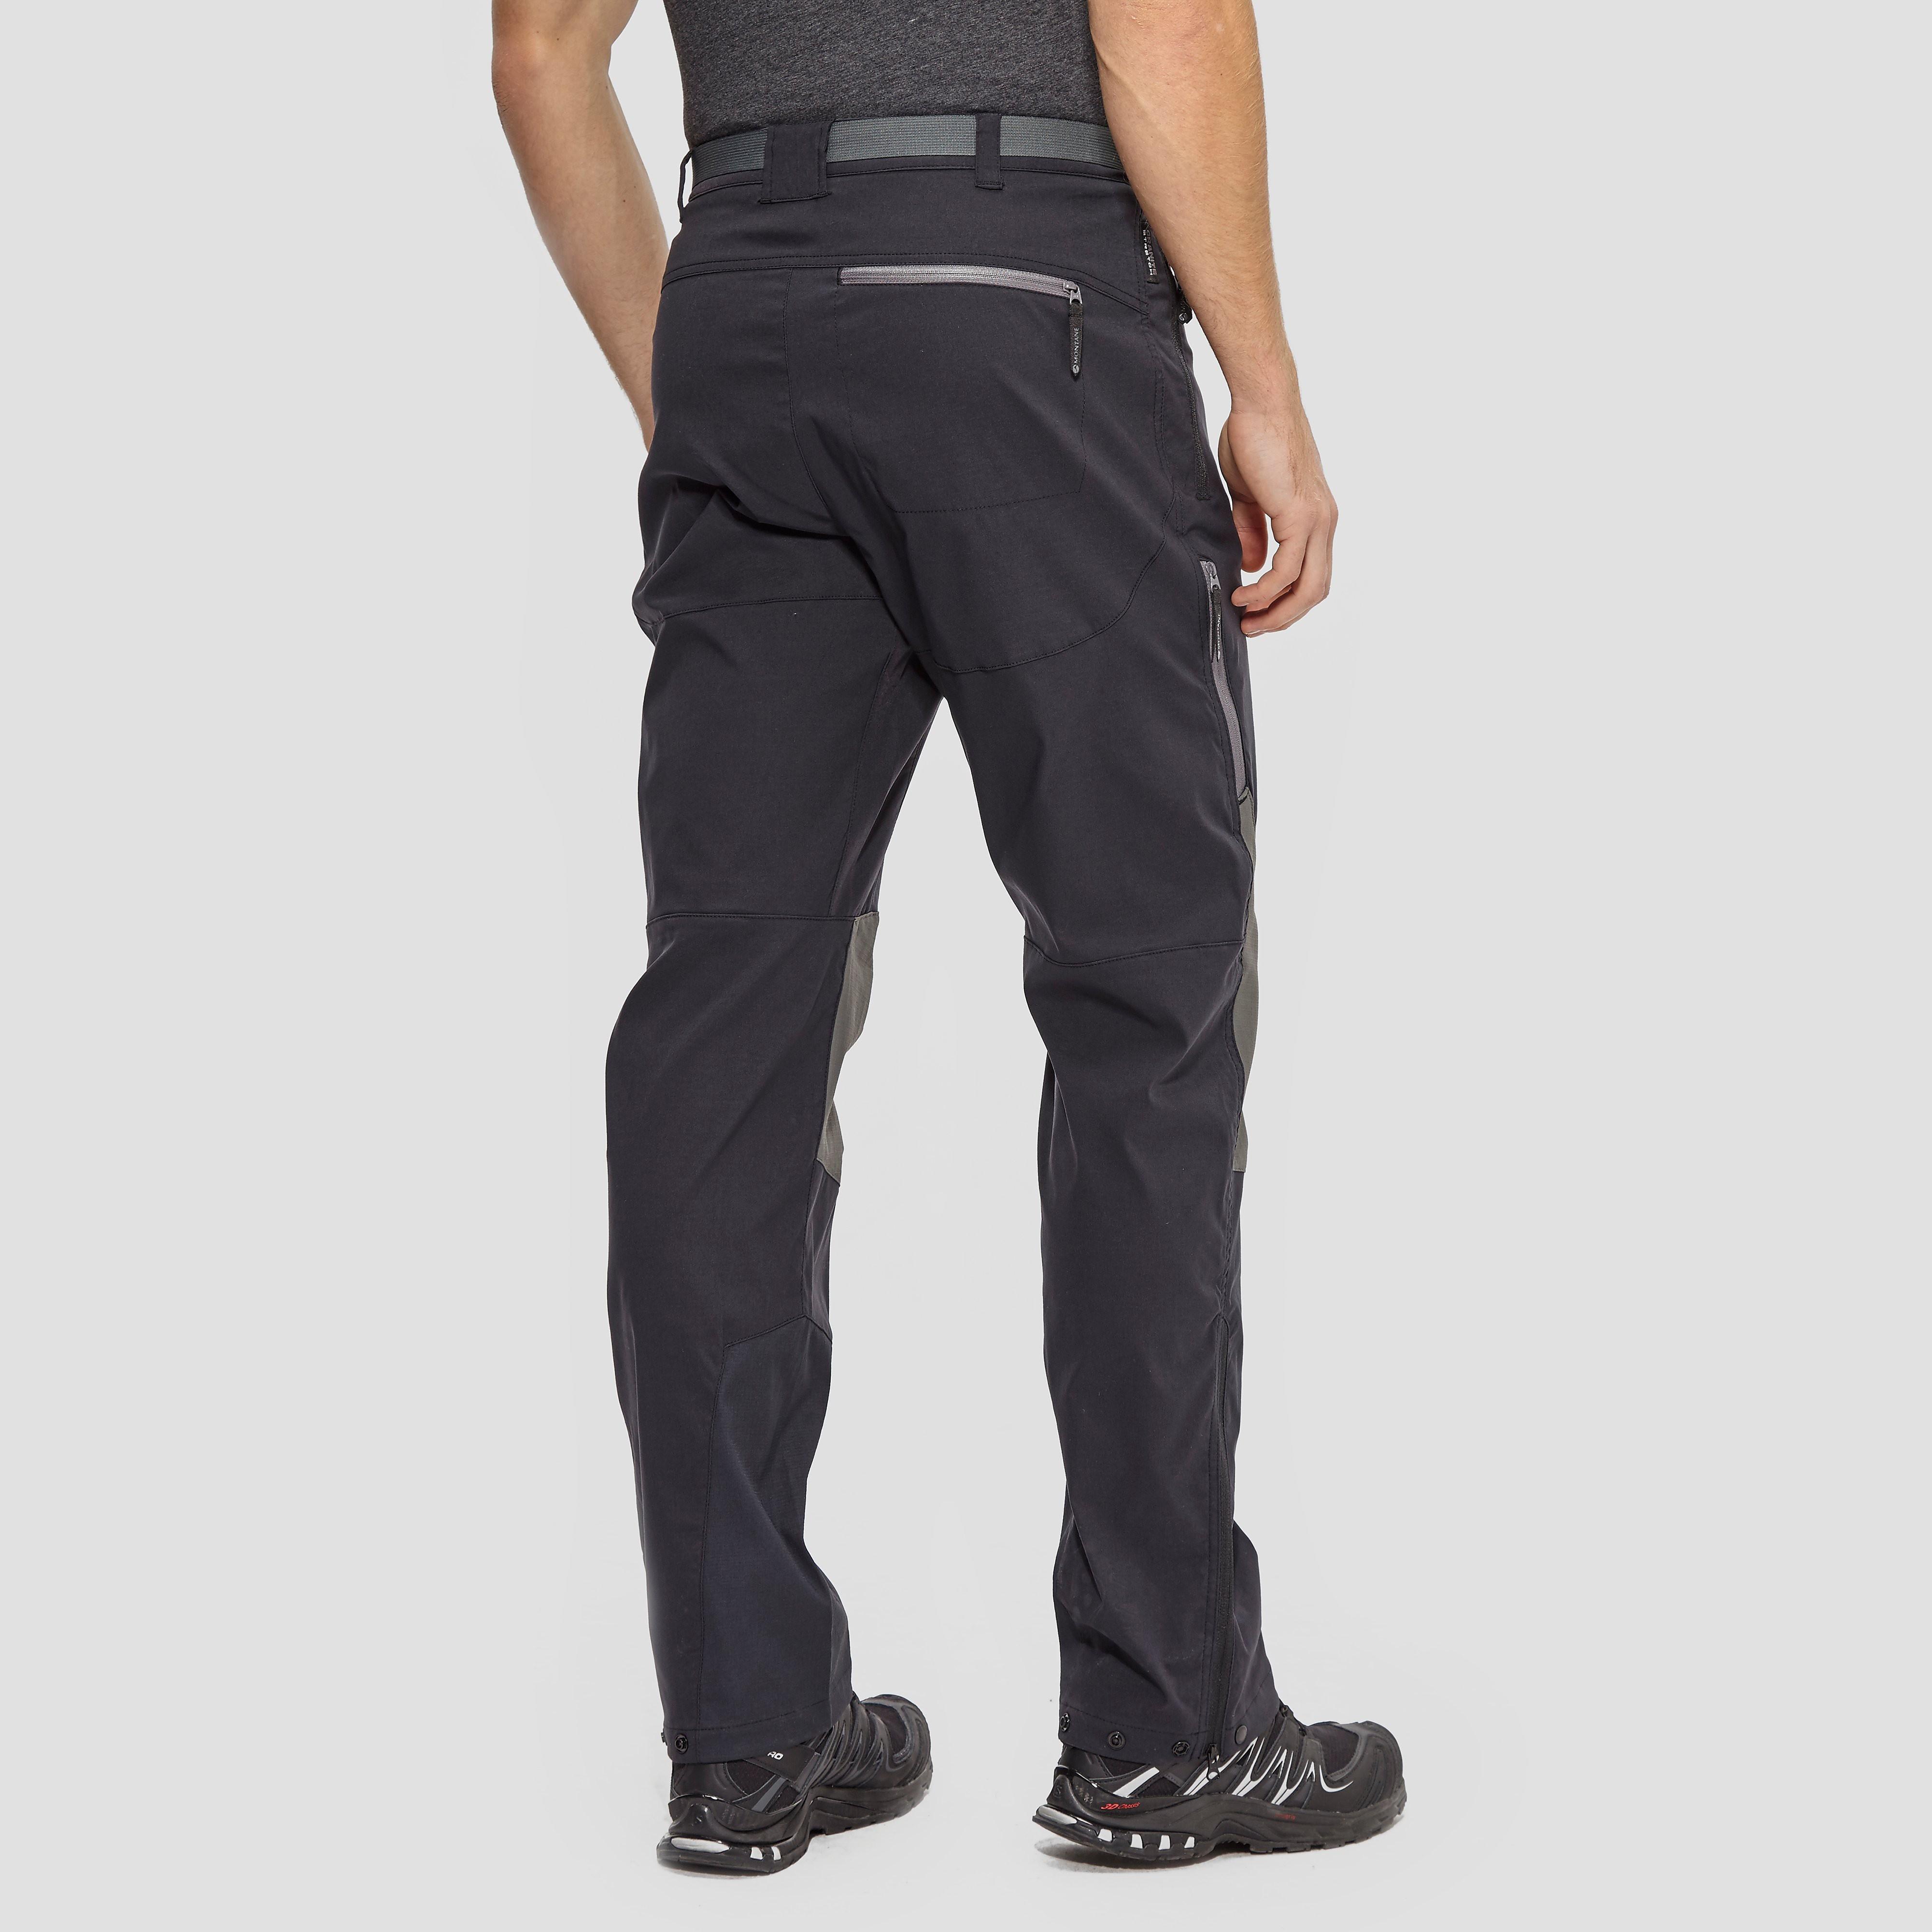 Montane Terra Stretch Pants (Regular)